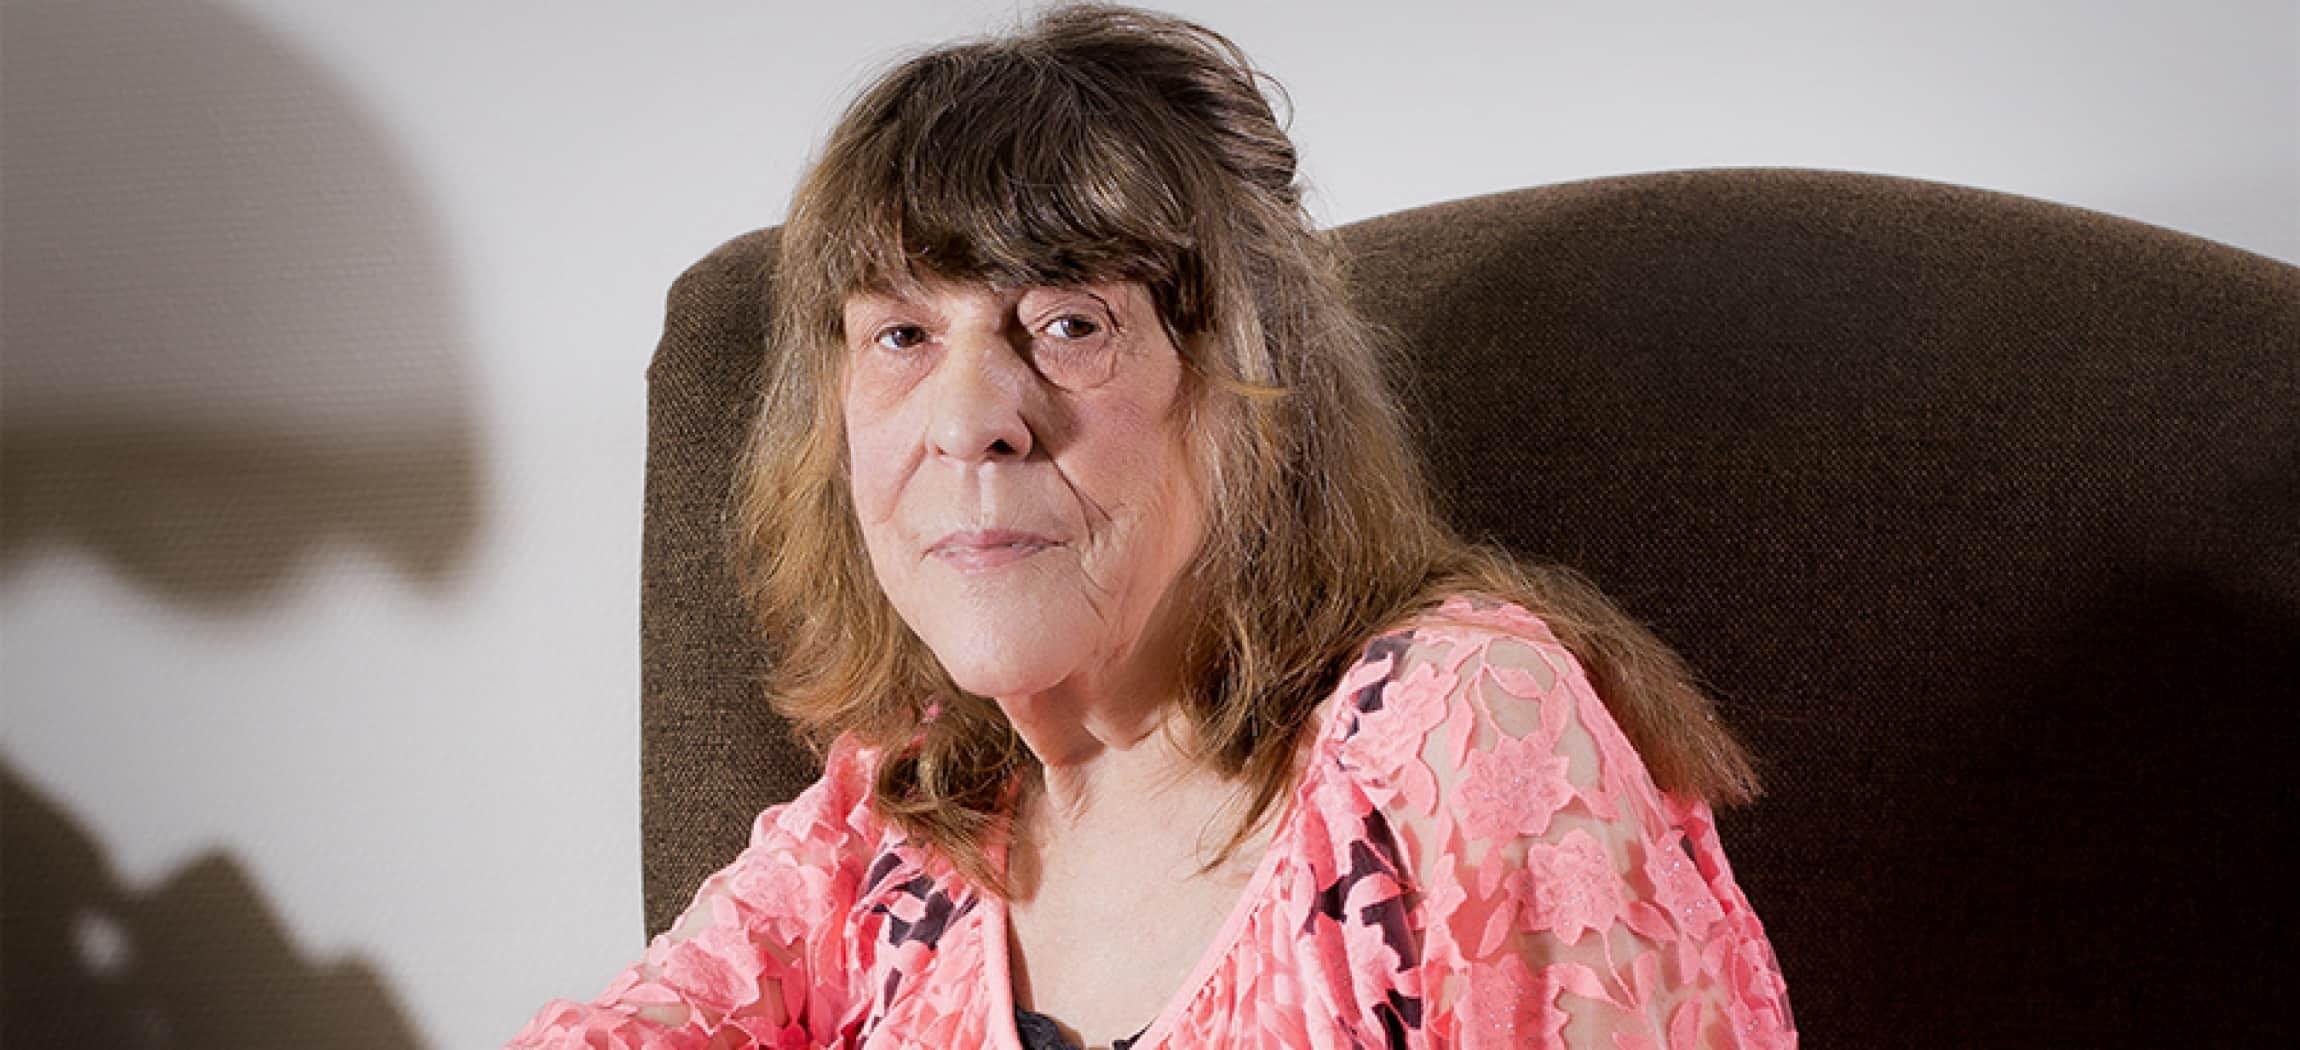 Mevrouw Rosenberg woont in Groepswoning Wolbrantskerkweg - uit de serie Mensen van Amstelring